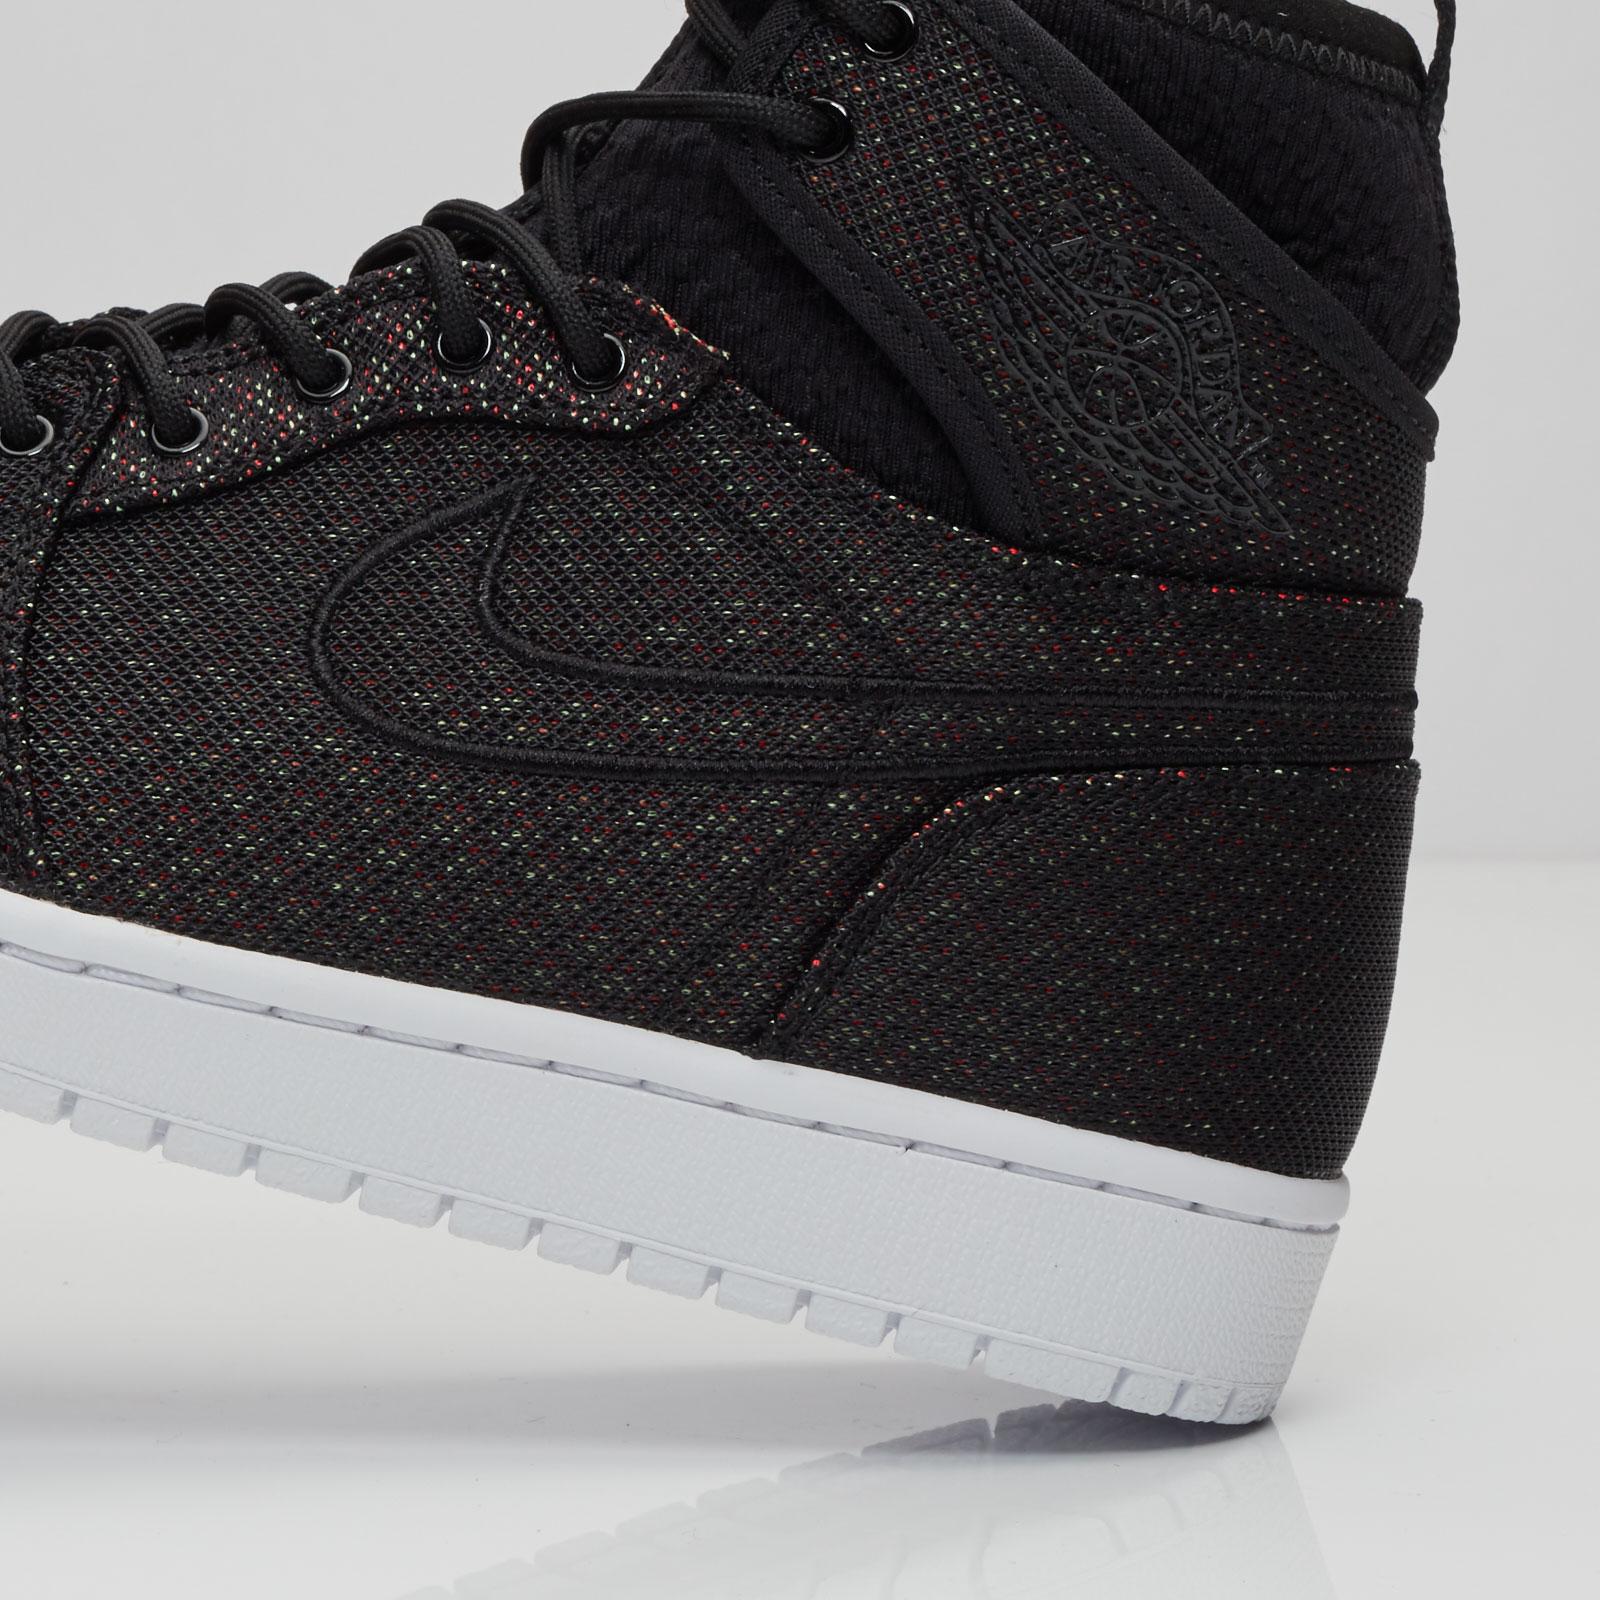 new style 01765 dc03b Jordan Brand Air Jordan 1 Retro Ultra High - 844700-050 - Sneakersnstuff    sneakers   streetwear online since 1999